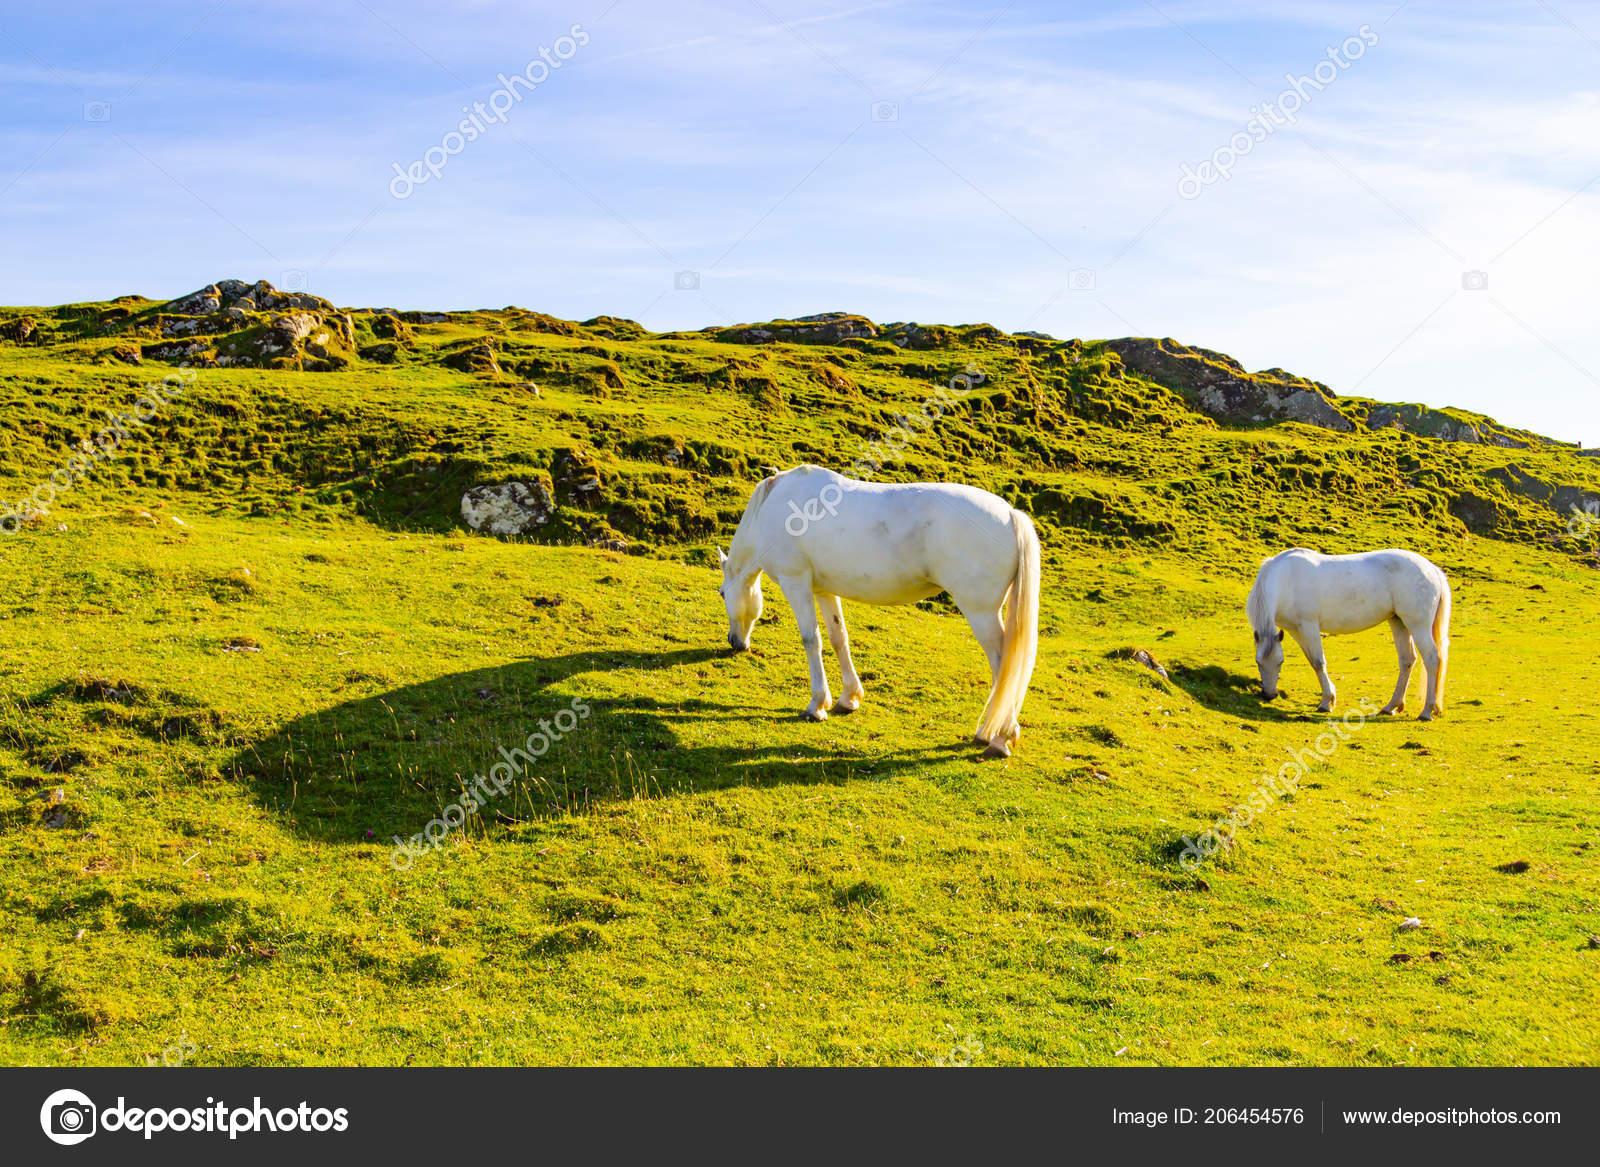 Pics Two White Horses Two White Horses Farm Field Clifden Ireland Stock Photo C Lltrarbach 206454576